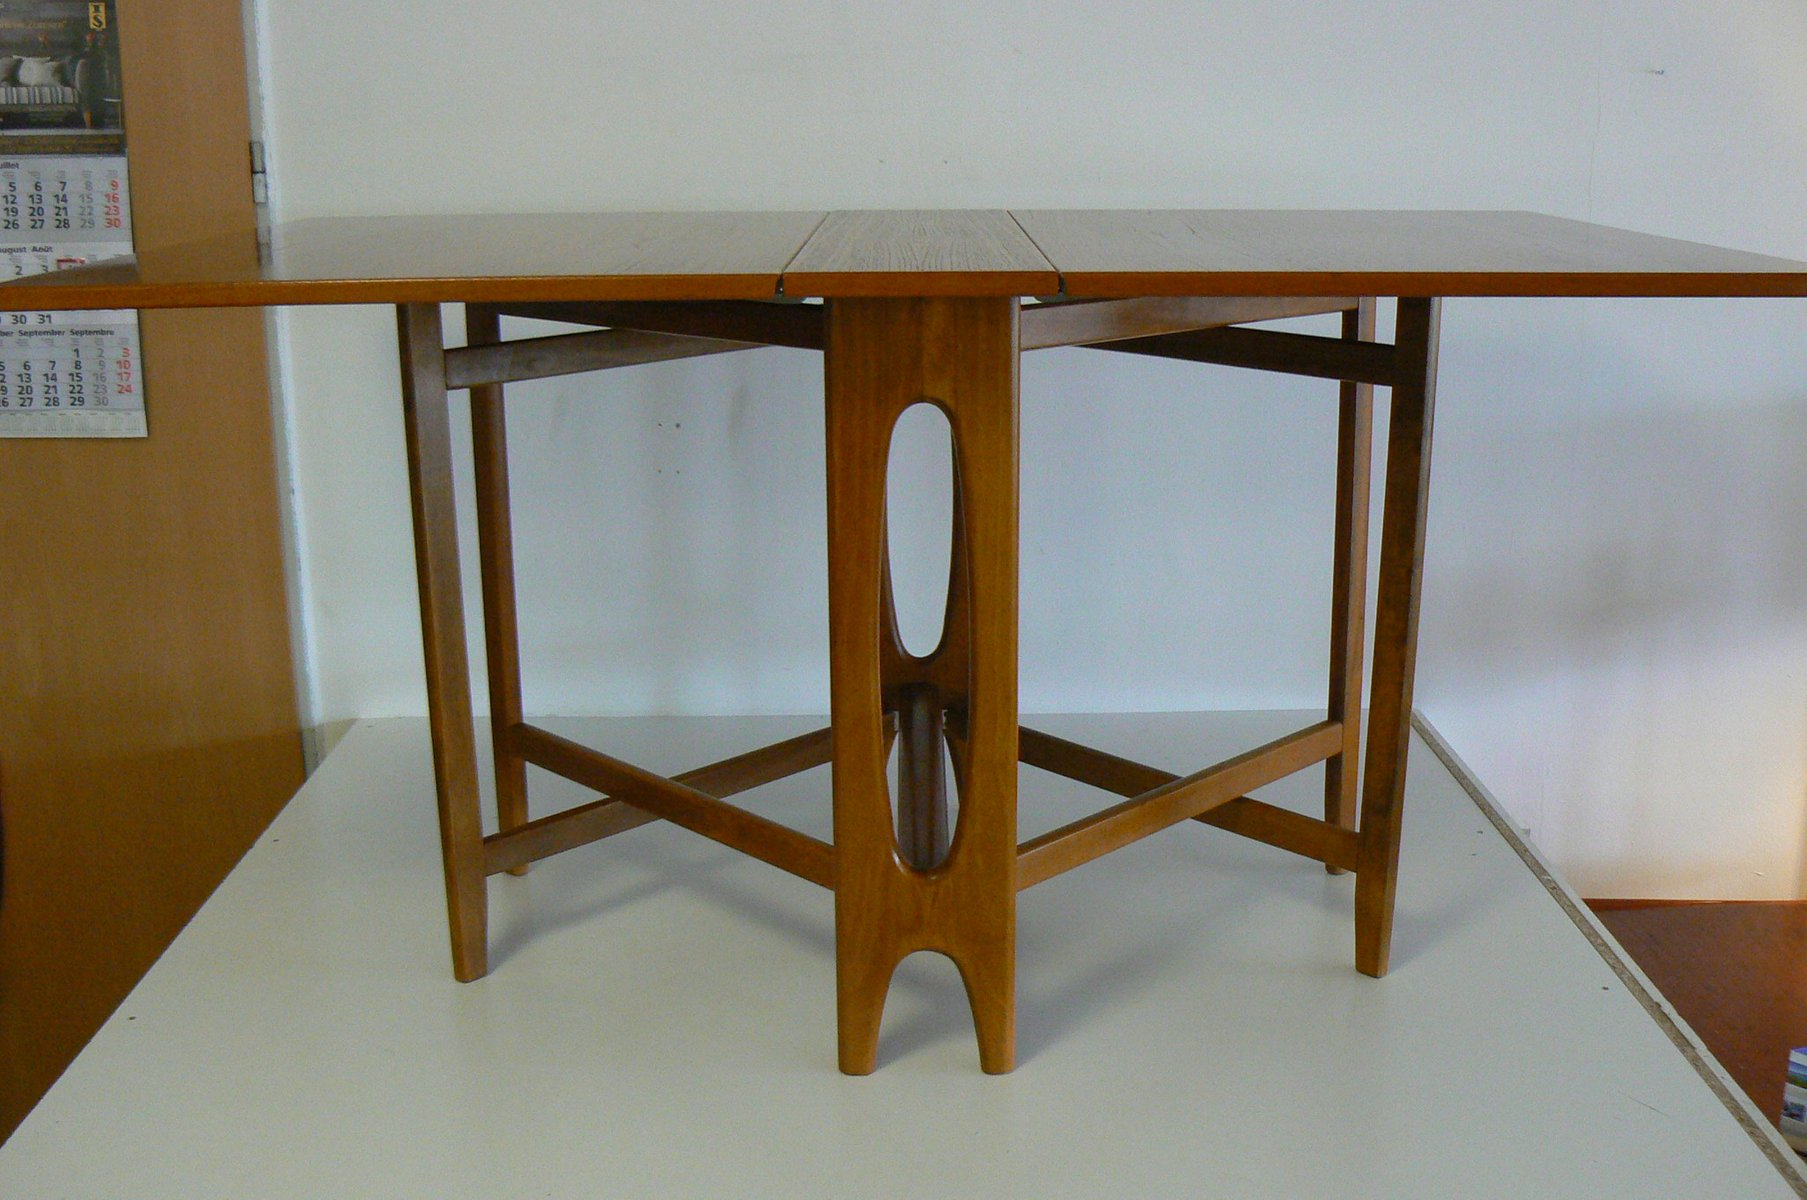 Vintage Folding Teak Dining Table by Bendt Winge for  : vintage folding teak dining table by bendt winge for kleppe mobelfabrikk 11 from www.pamono.com size 1807 x 1200 jpeg 154kB